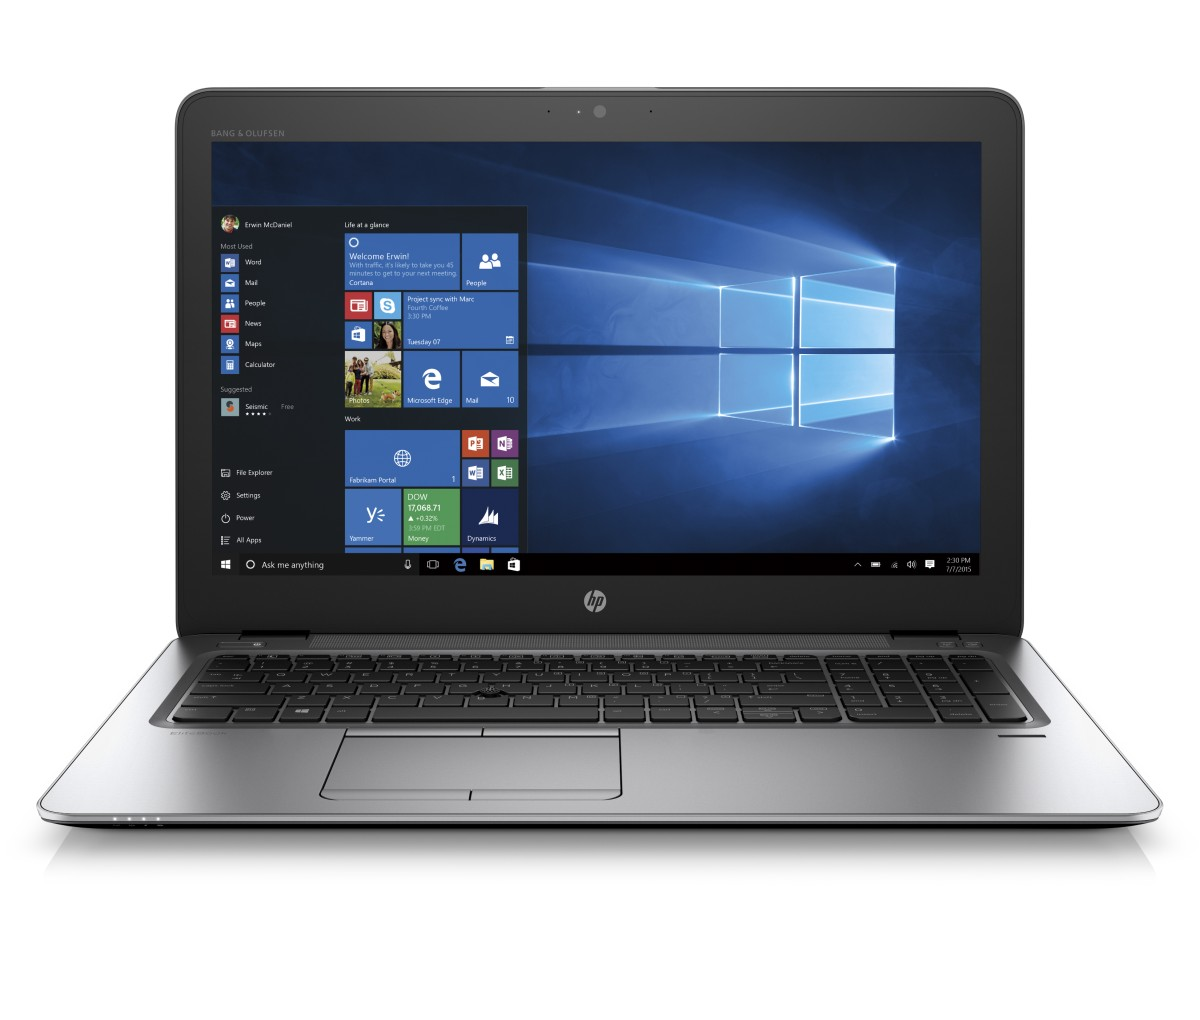 "HP EliteBook 755 G4 15.6"" FHDA12-9800B/8GB/256SSD/VGA/DP/RJ45/WIFI/4G/BT/MCR/FPR/3RServis/W10P"